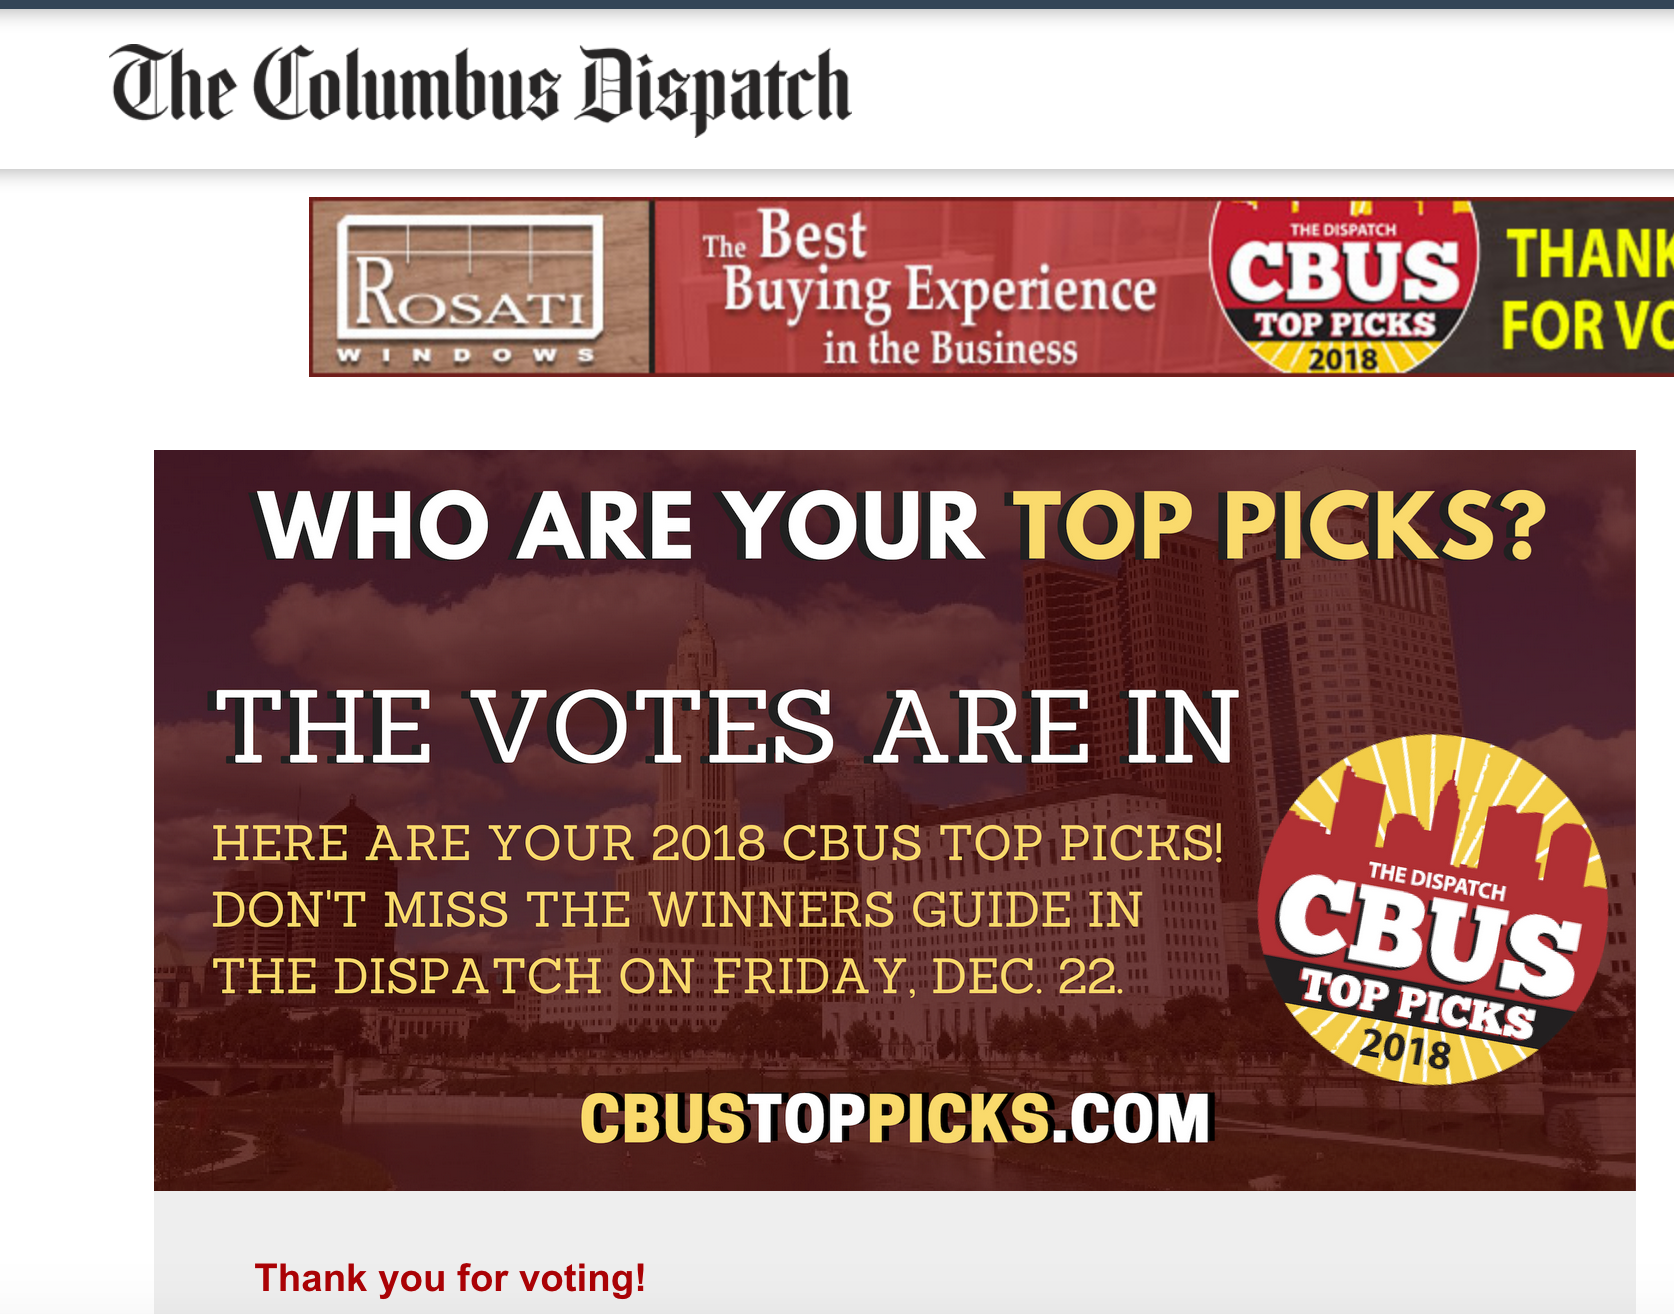 COLUMBUS DISPATCH CBUS TOP PICKS- BEST LOCAL COFFEE SHOP: '17, '18